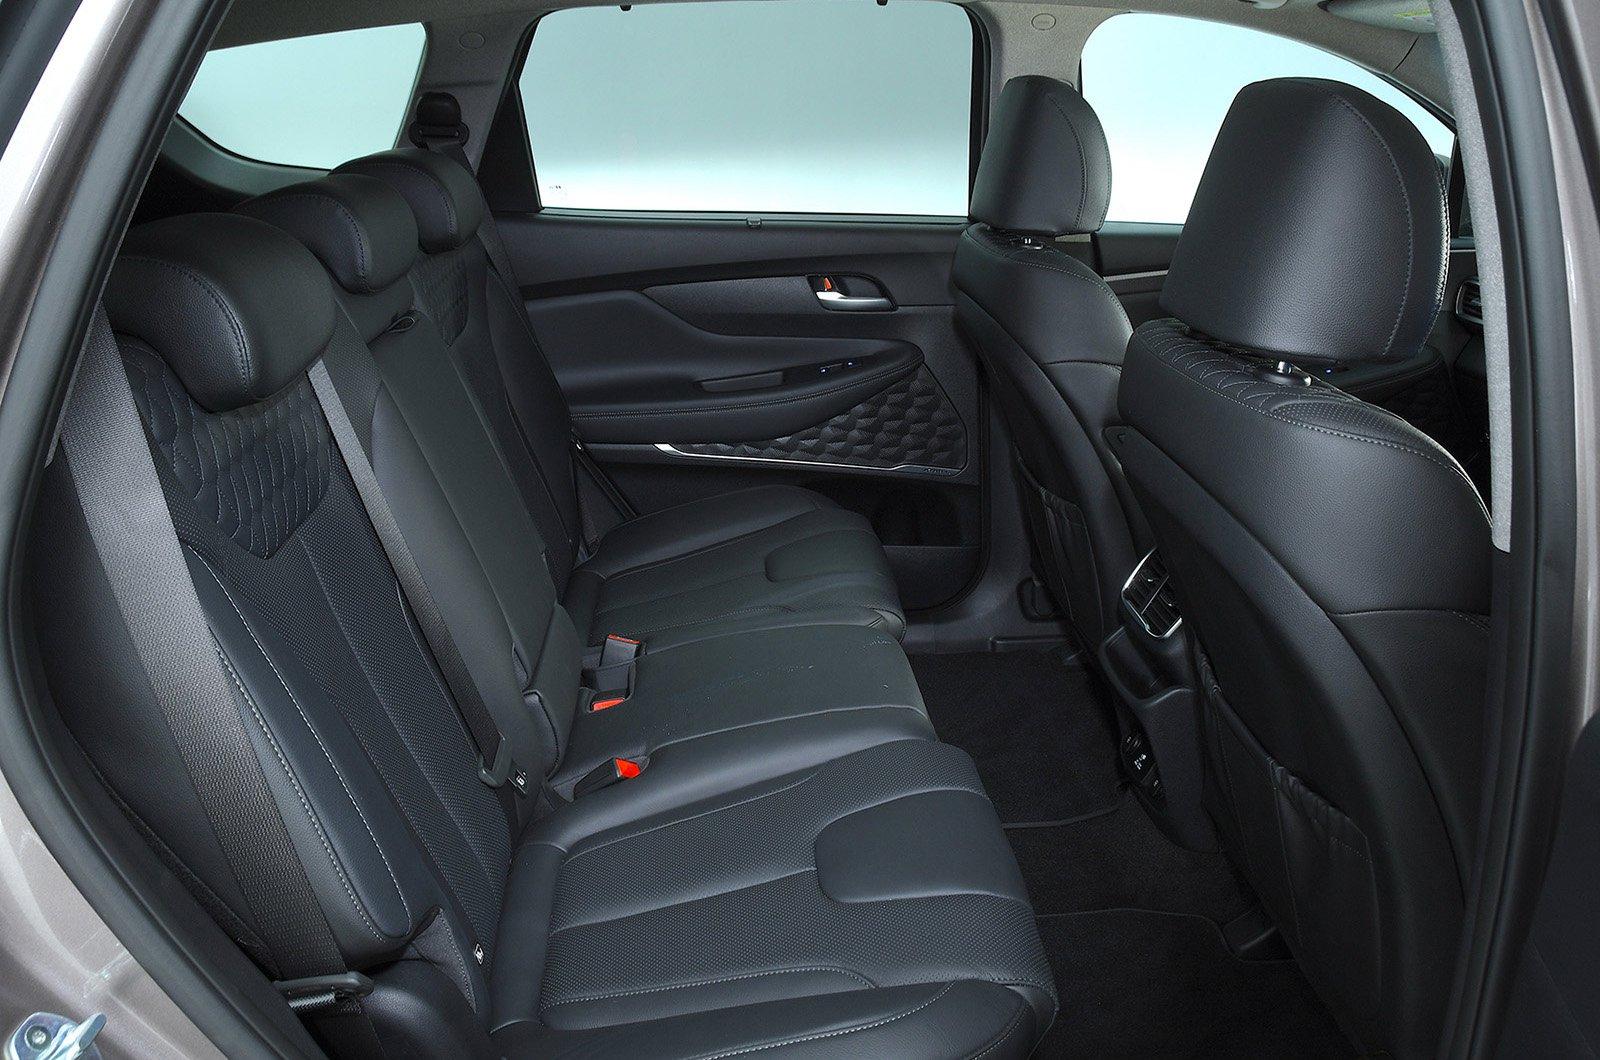 Hyundai Santa Fe back seats